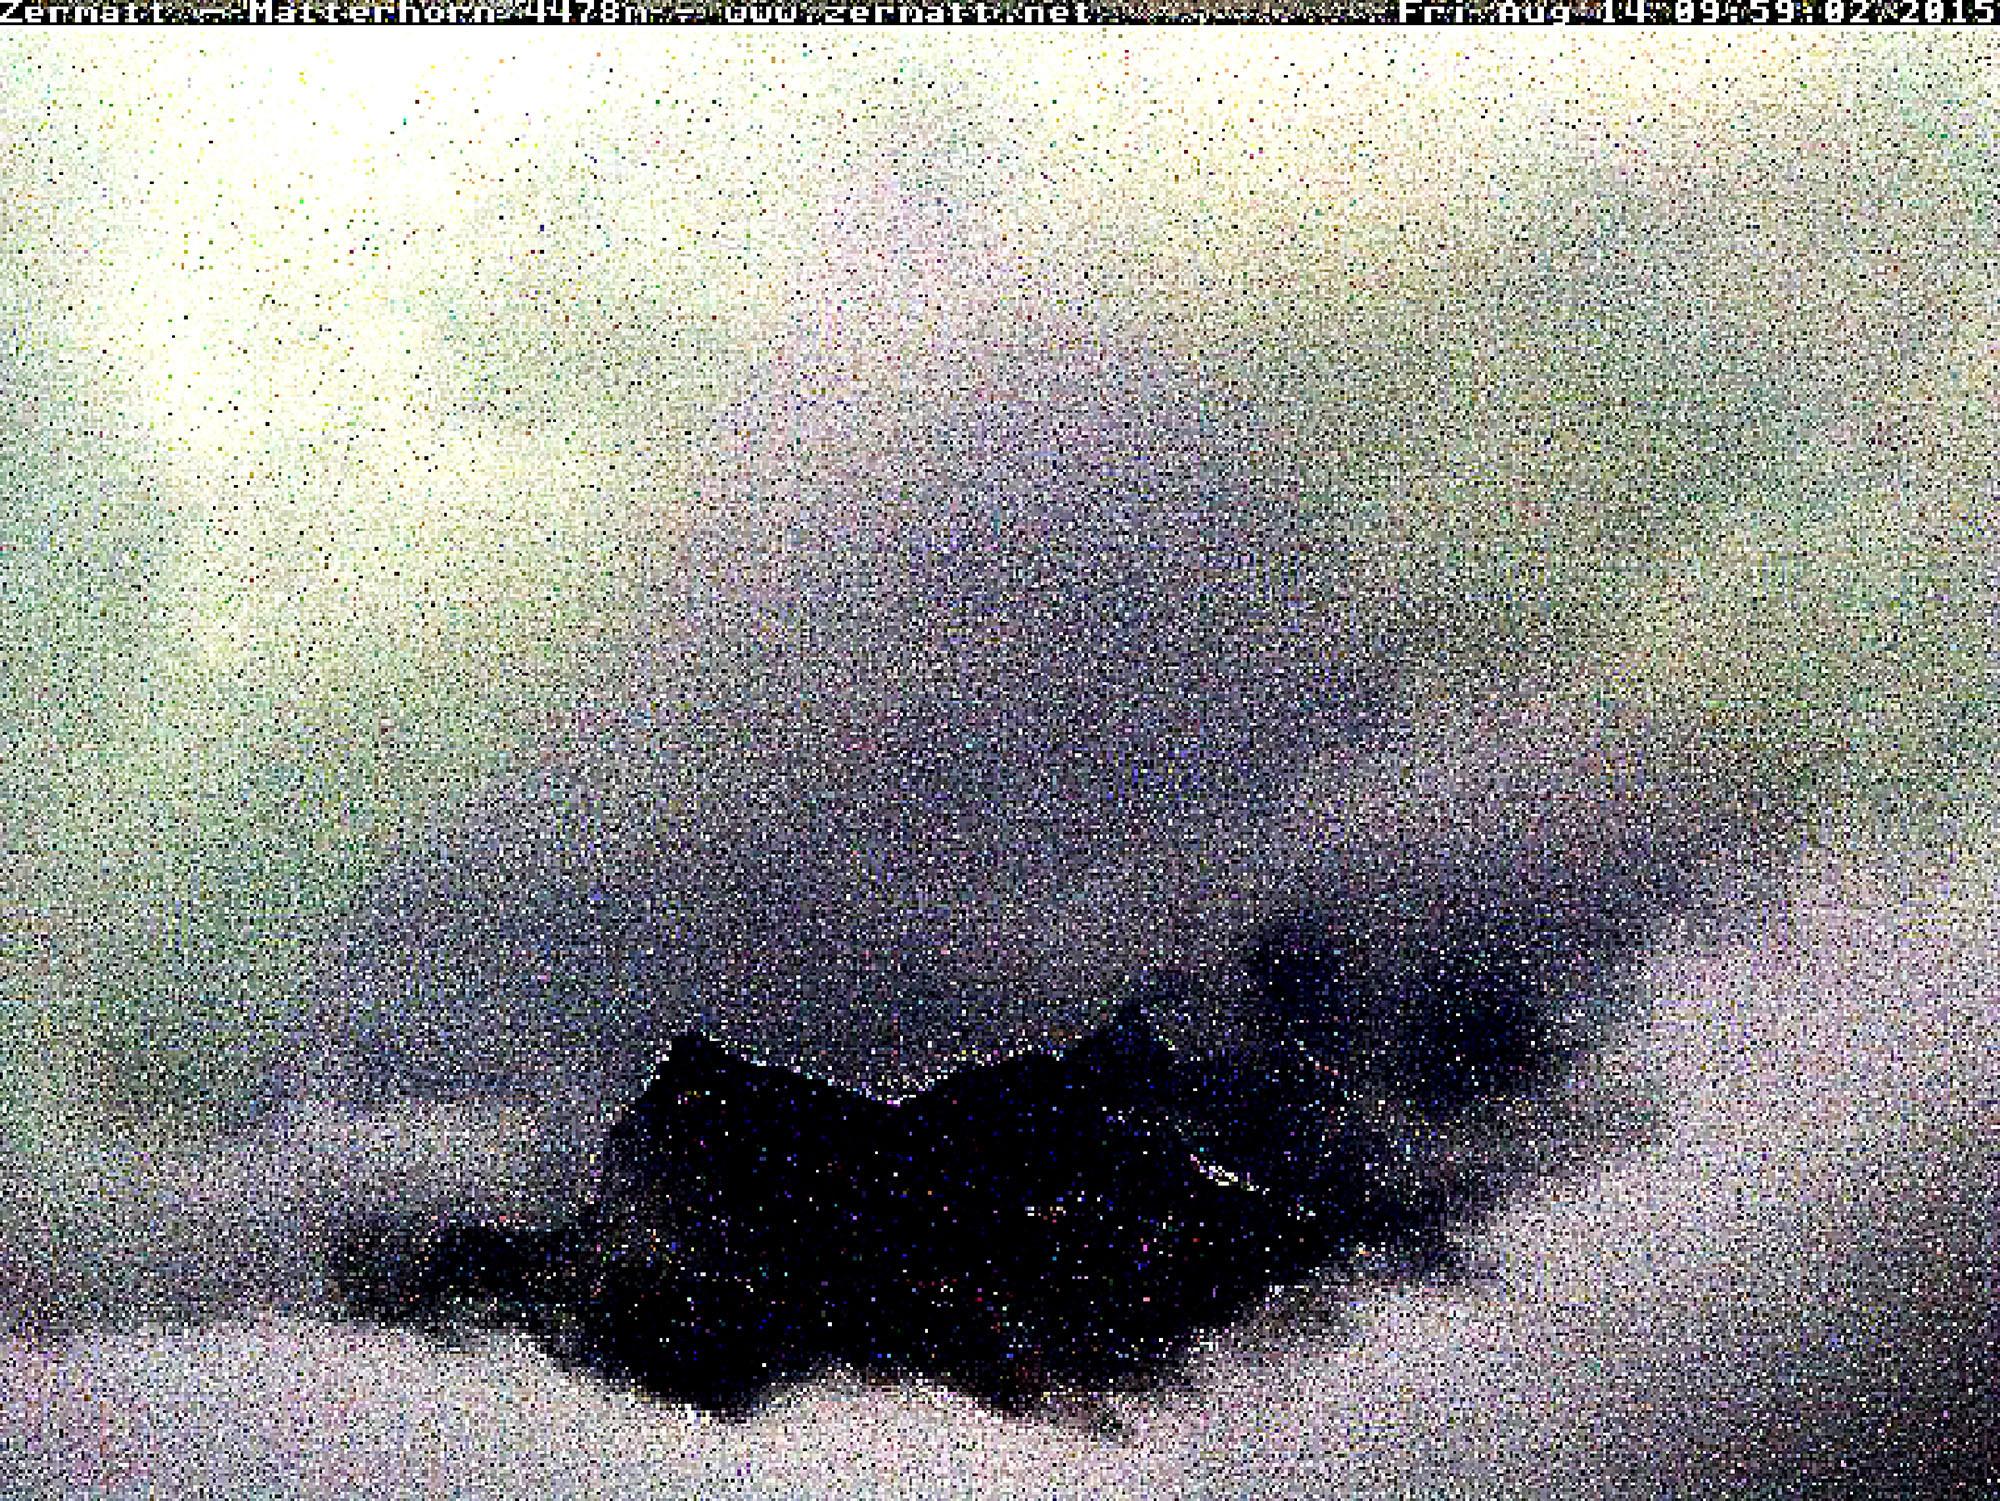 Matterhorn, Cervin, montagne, glaciers, glacier, jacques, Pugin, Zermatt,   #1960 Matterhorn 2015 08 14